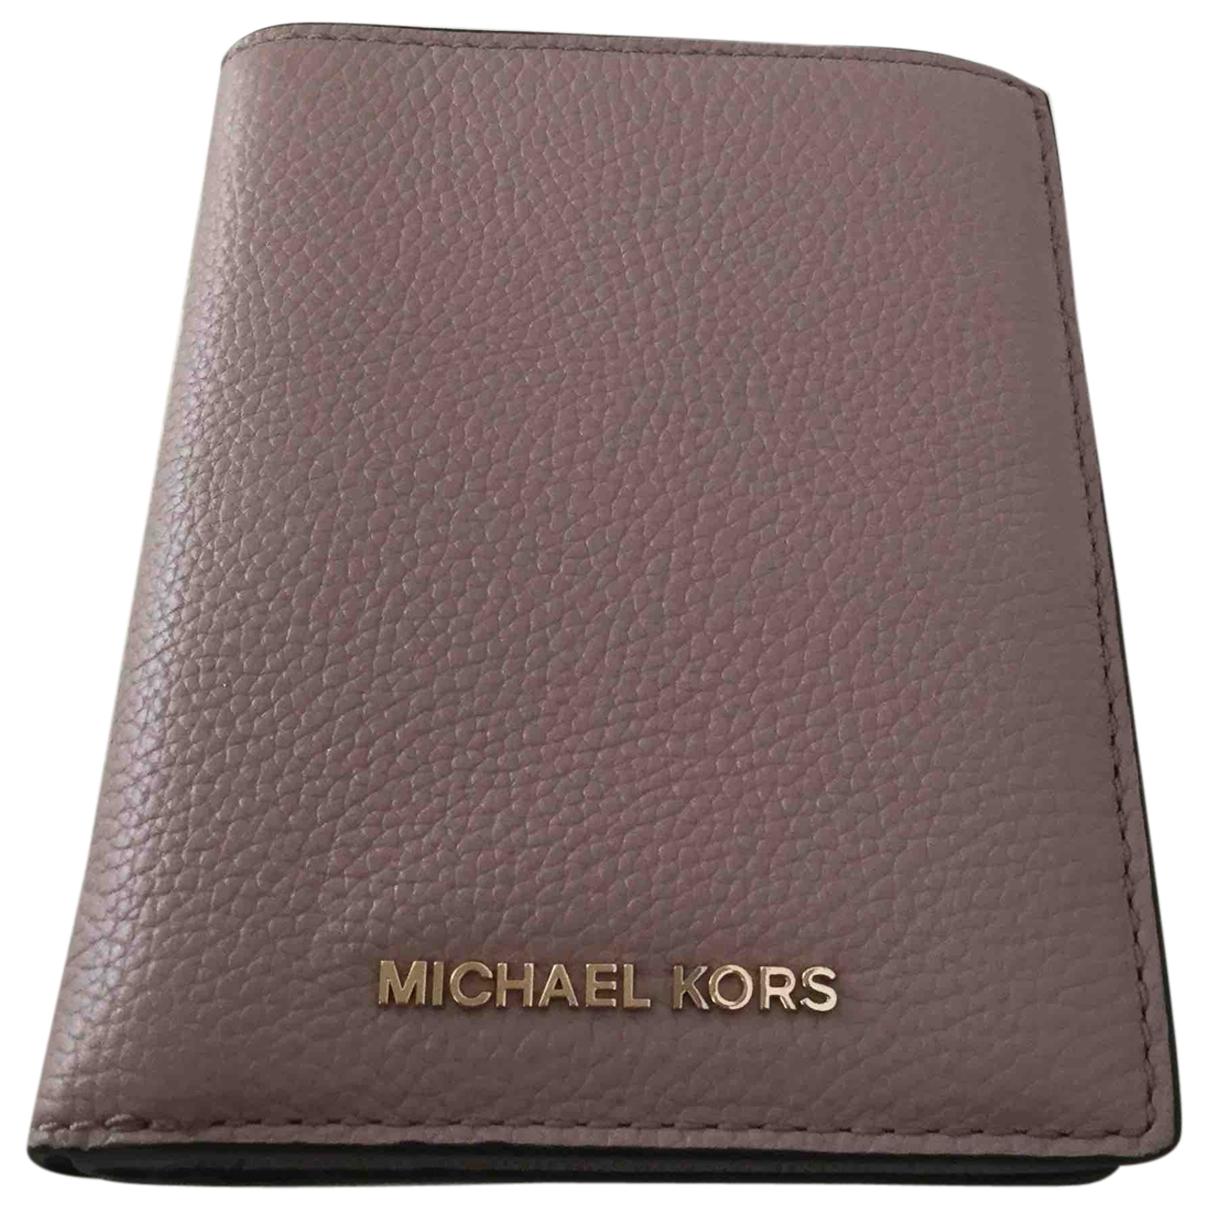 Michael Kors \N Beige Leather wallet for Women \N